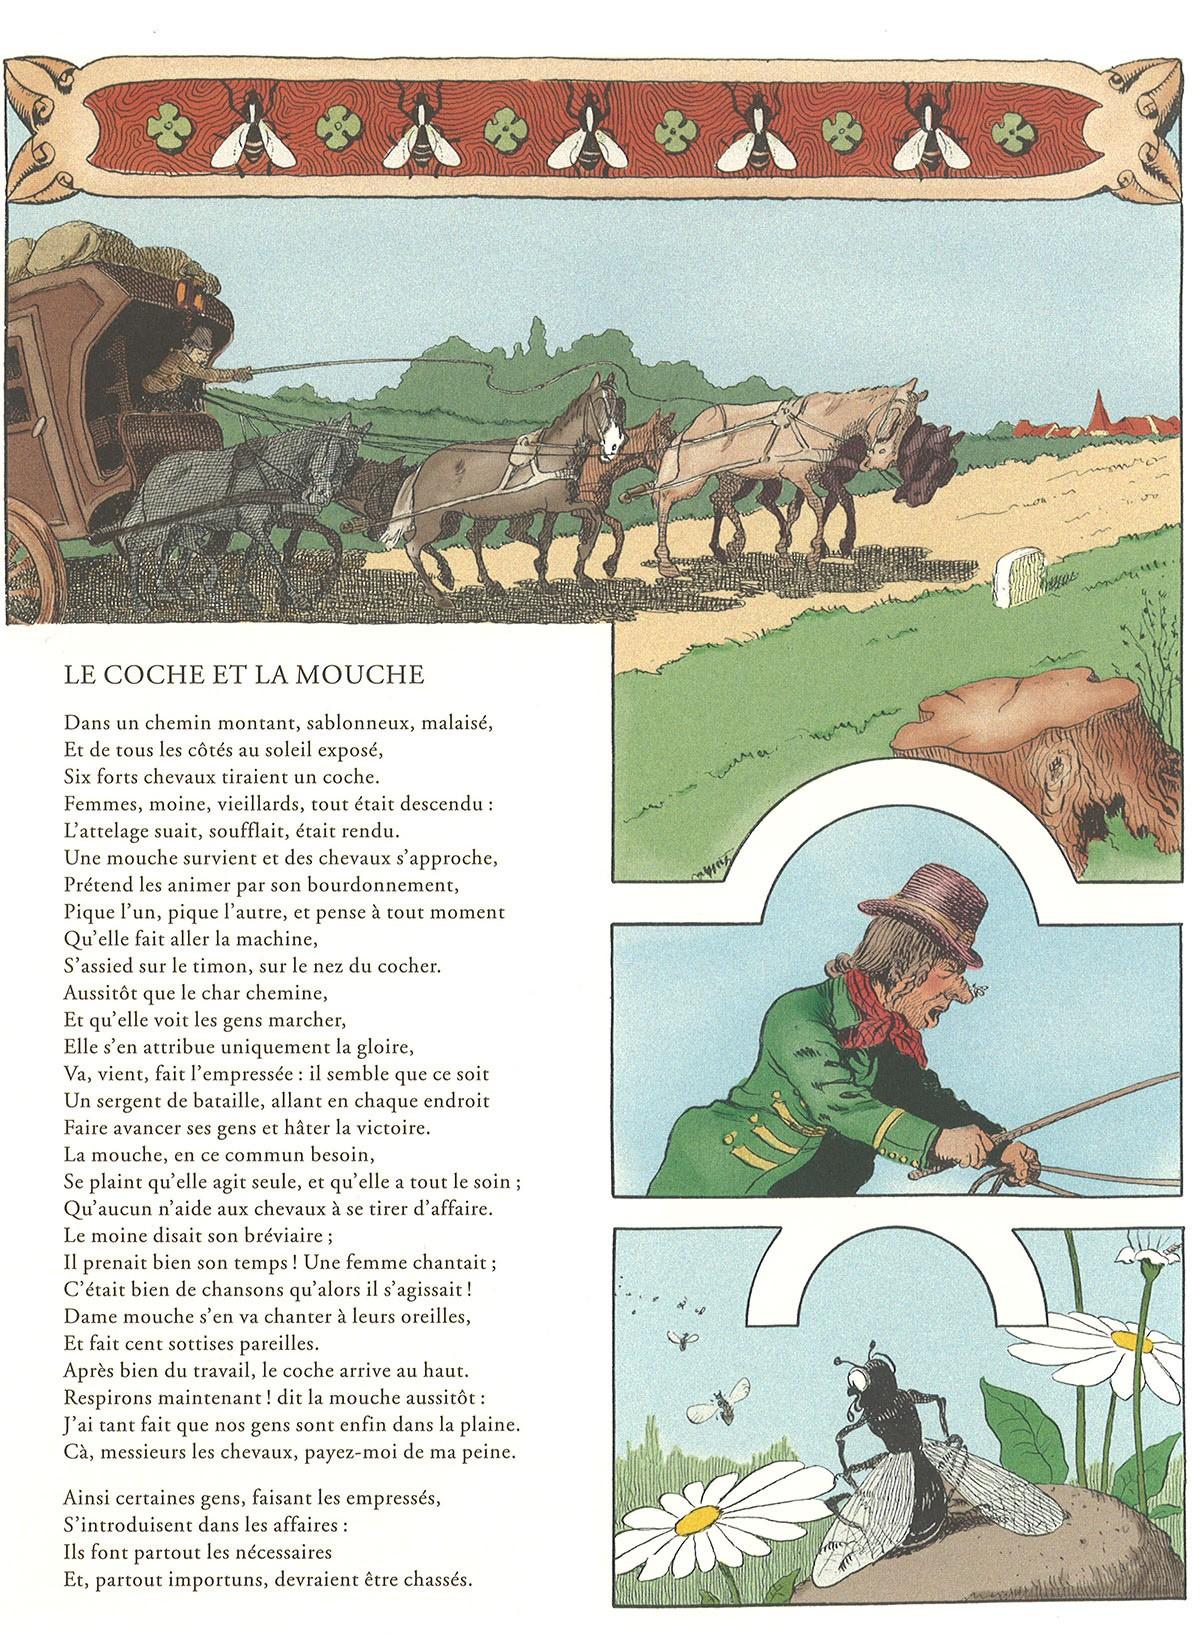 La Mouche Et Le Coche : mouche, coche, Coche, Mouche, (Jean, Fontaine,, Illustrations, Benjamin, Rabier,, 1906)